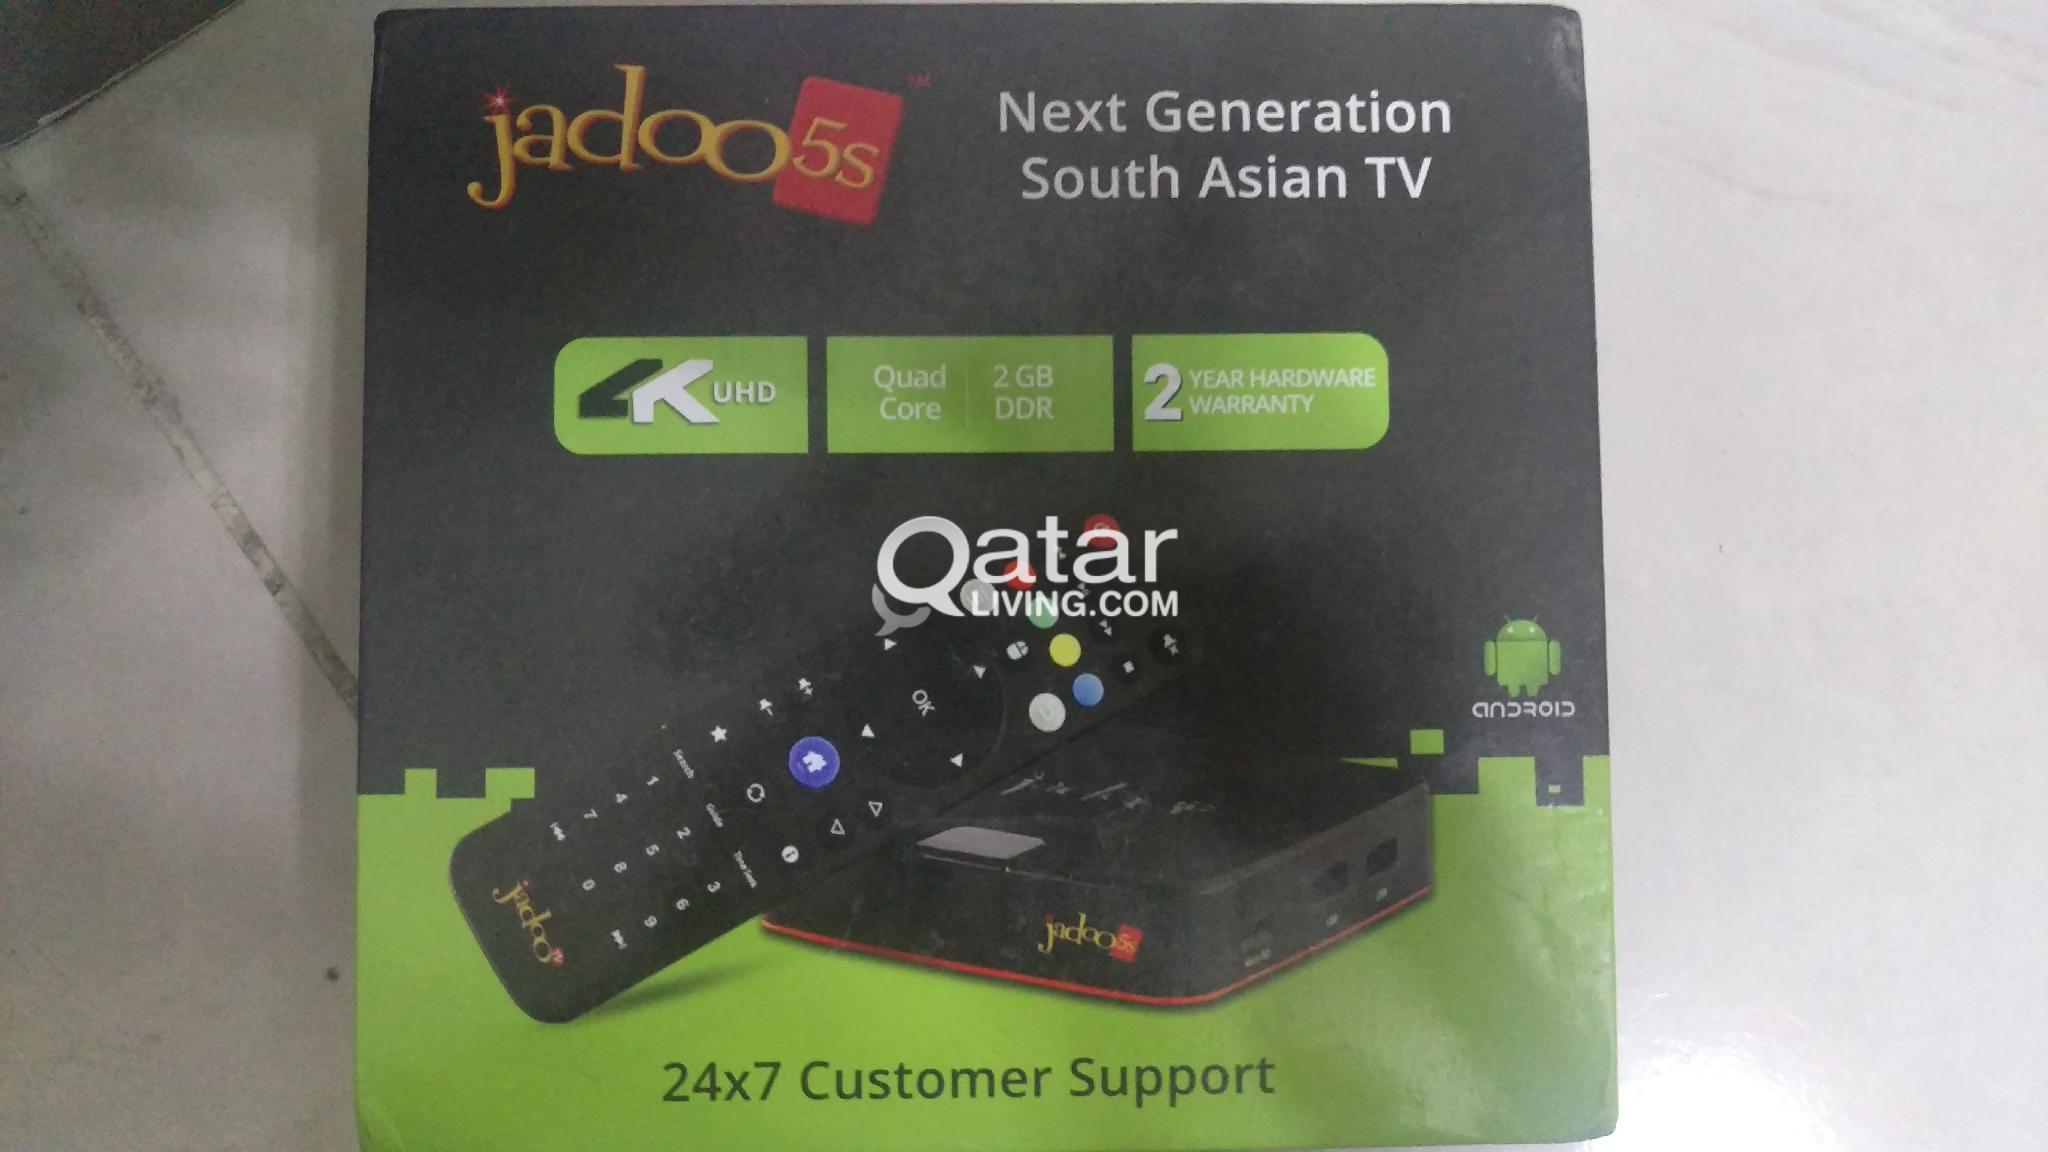 IPTV set top box (jadoo tv) | Qatar Living